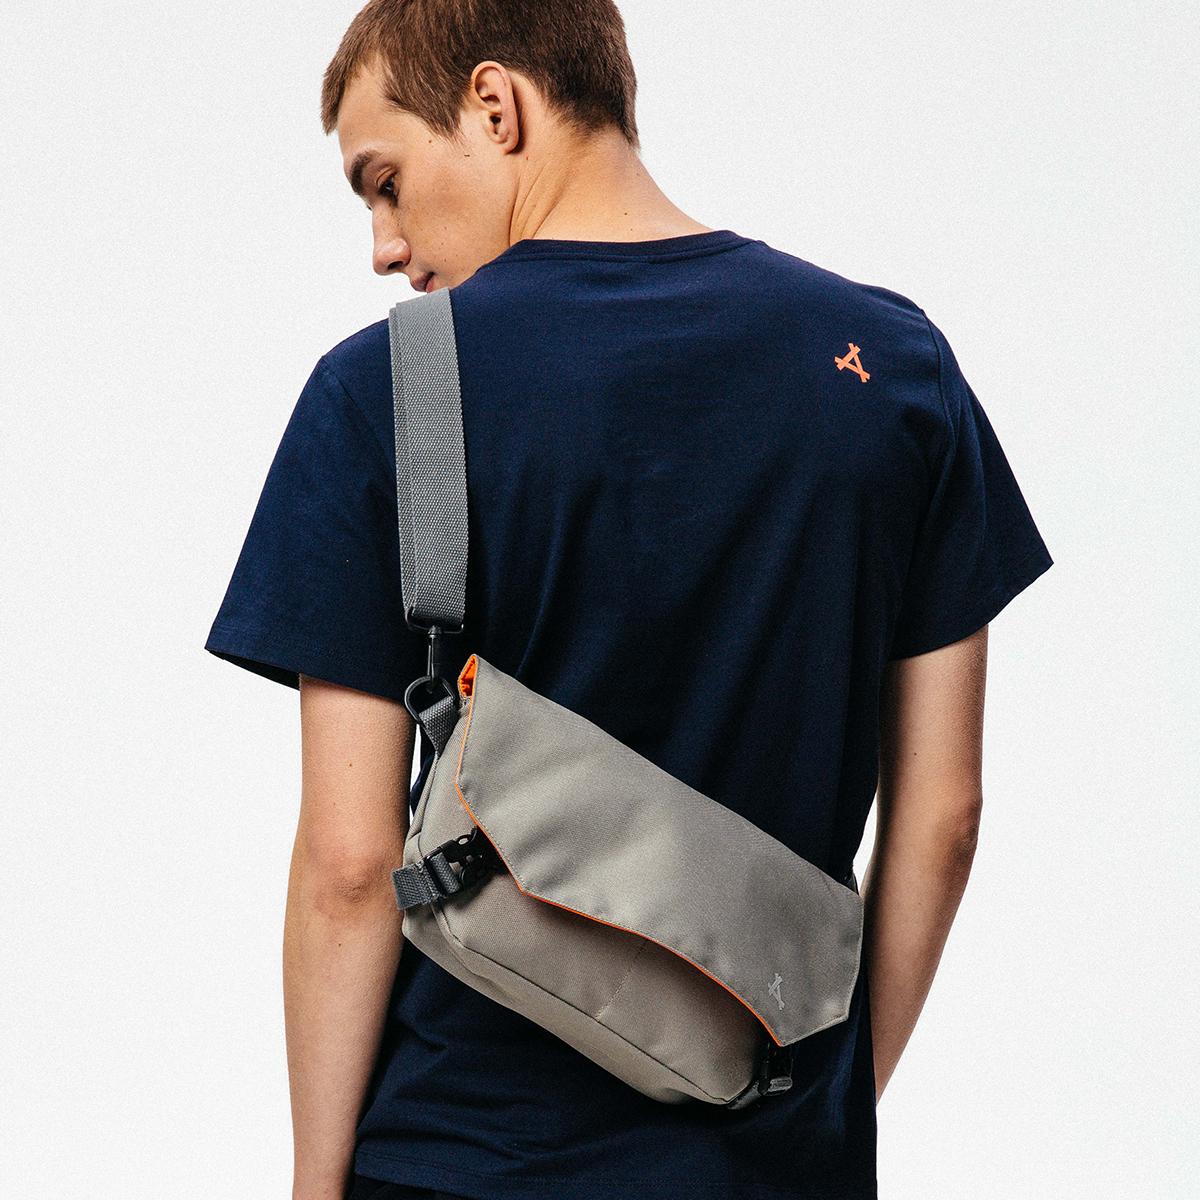 KON2018新款时尚潮流斜挎包男士青年学生单肩包休闲运动户外胸包